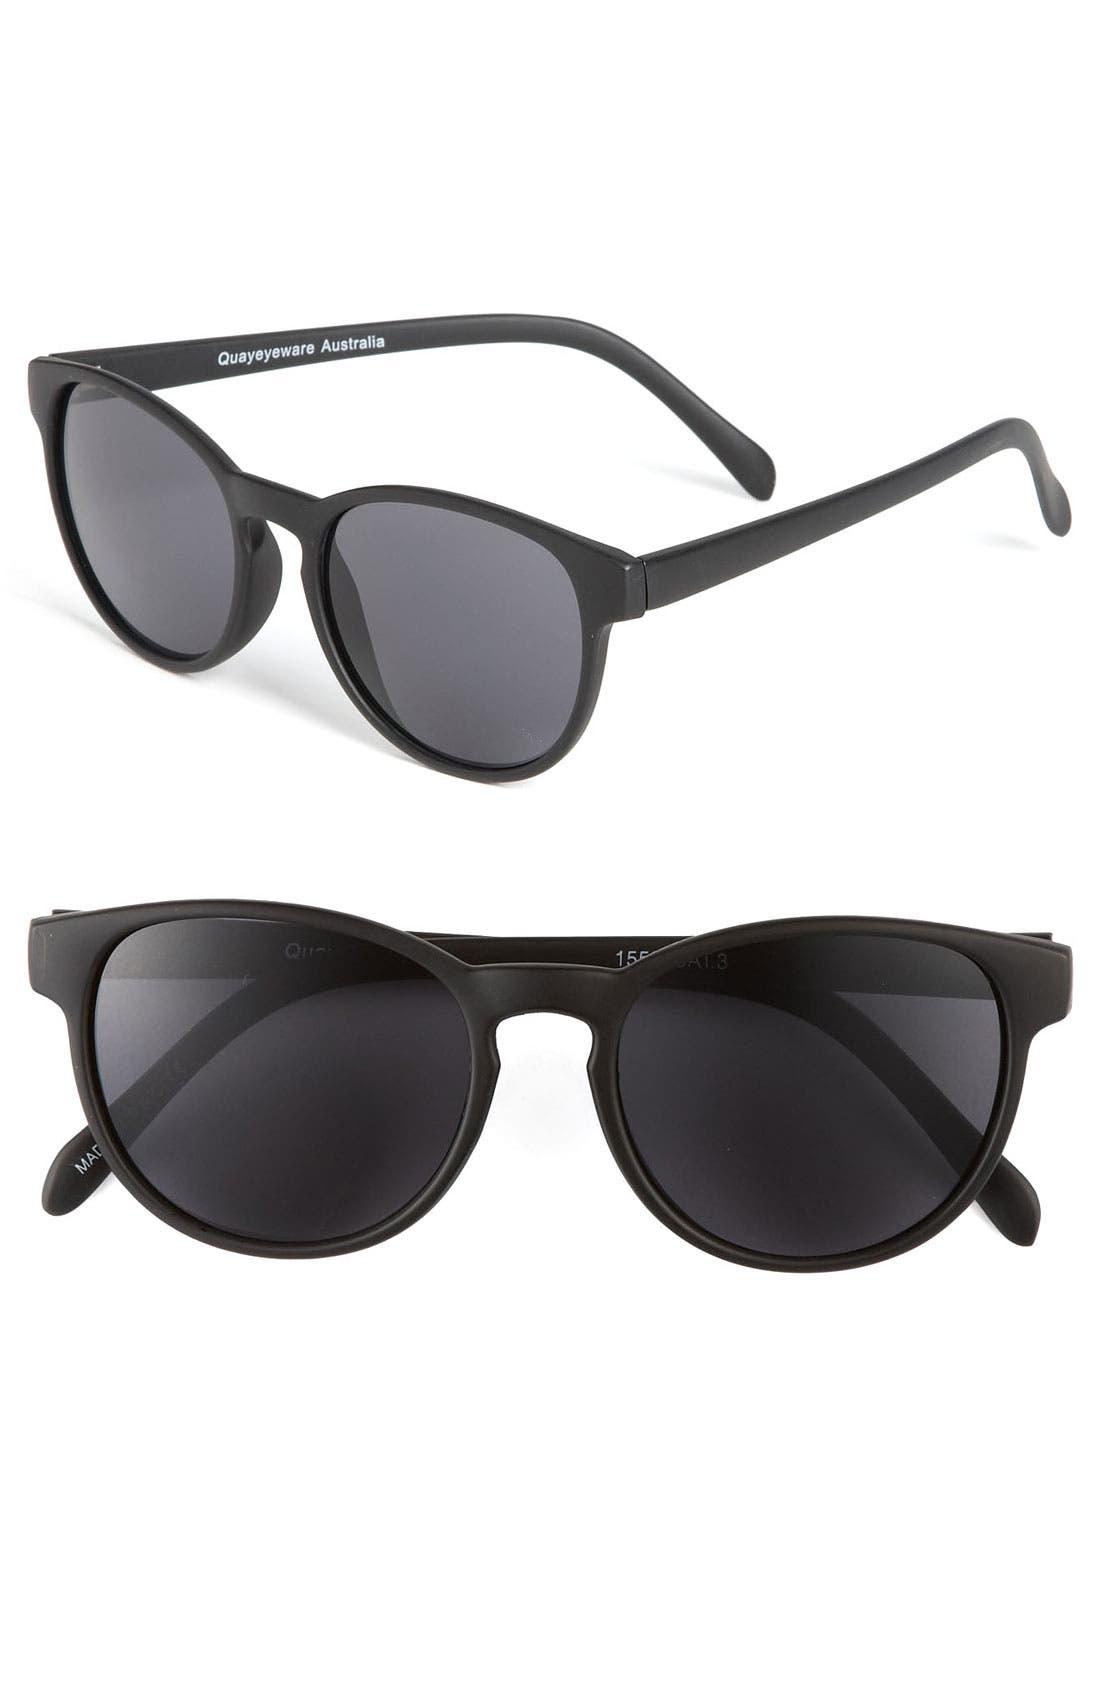 Main Image - Quay Oversized Sunglasses